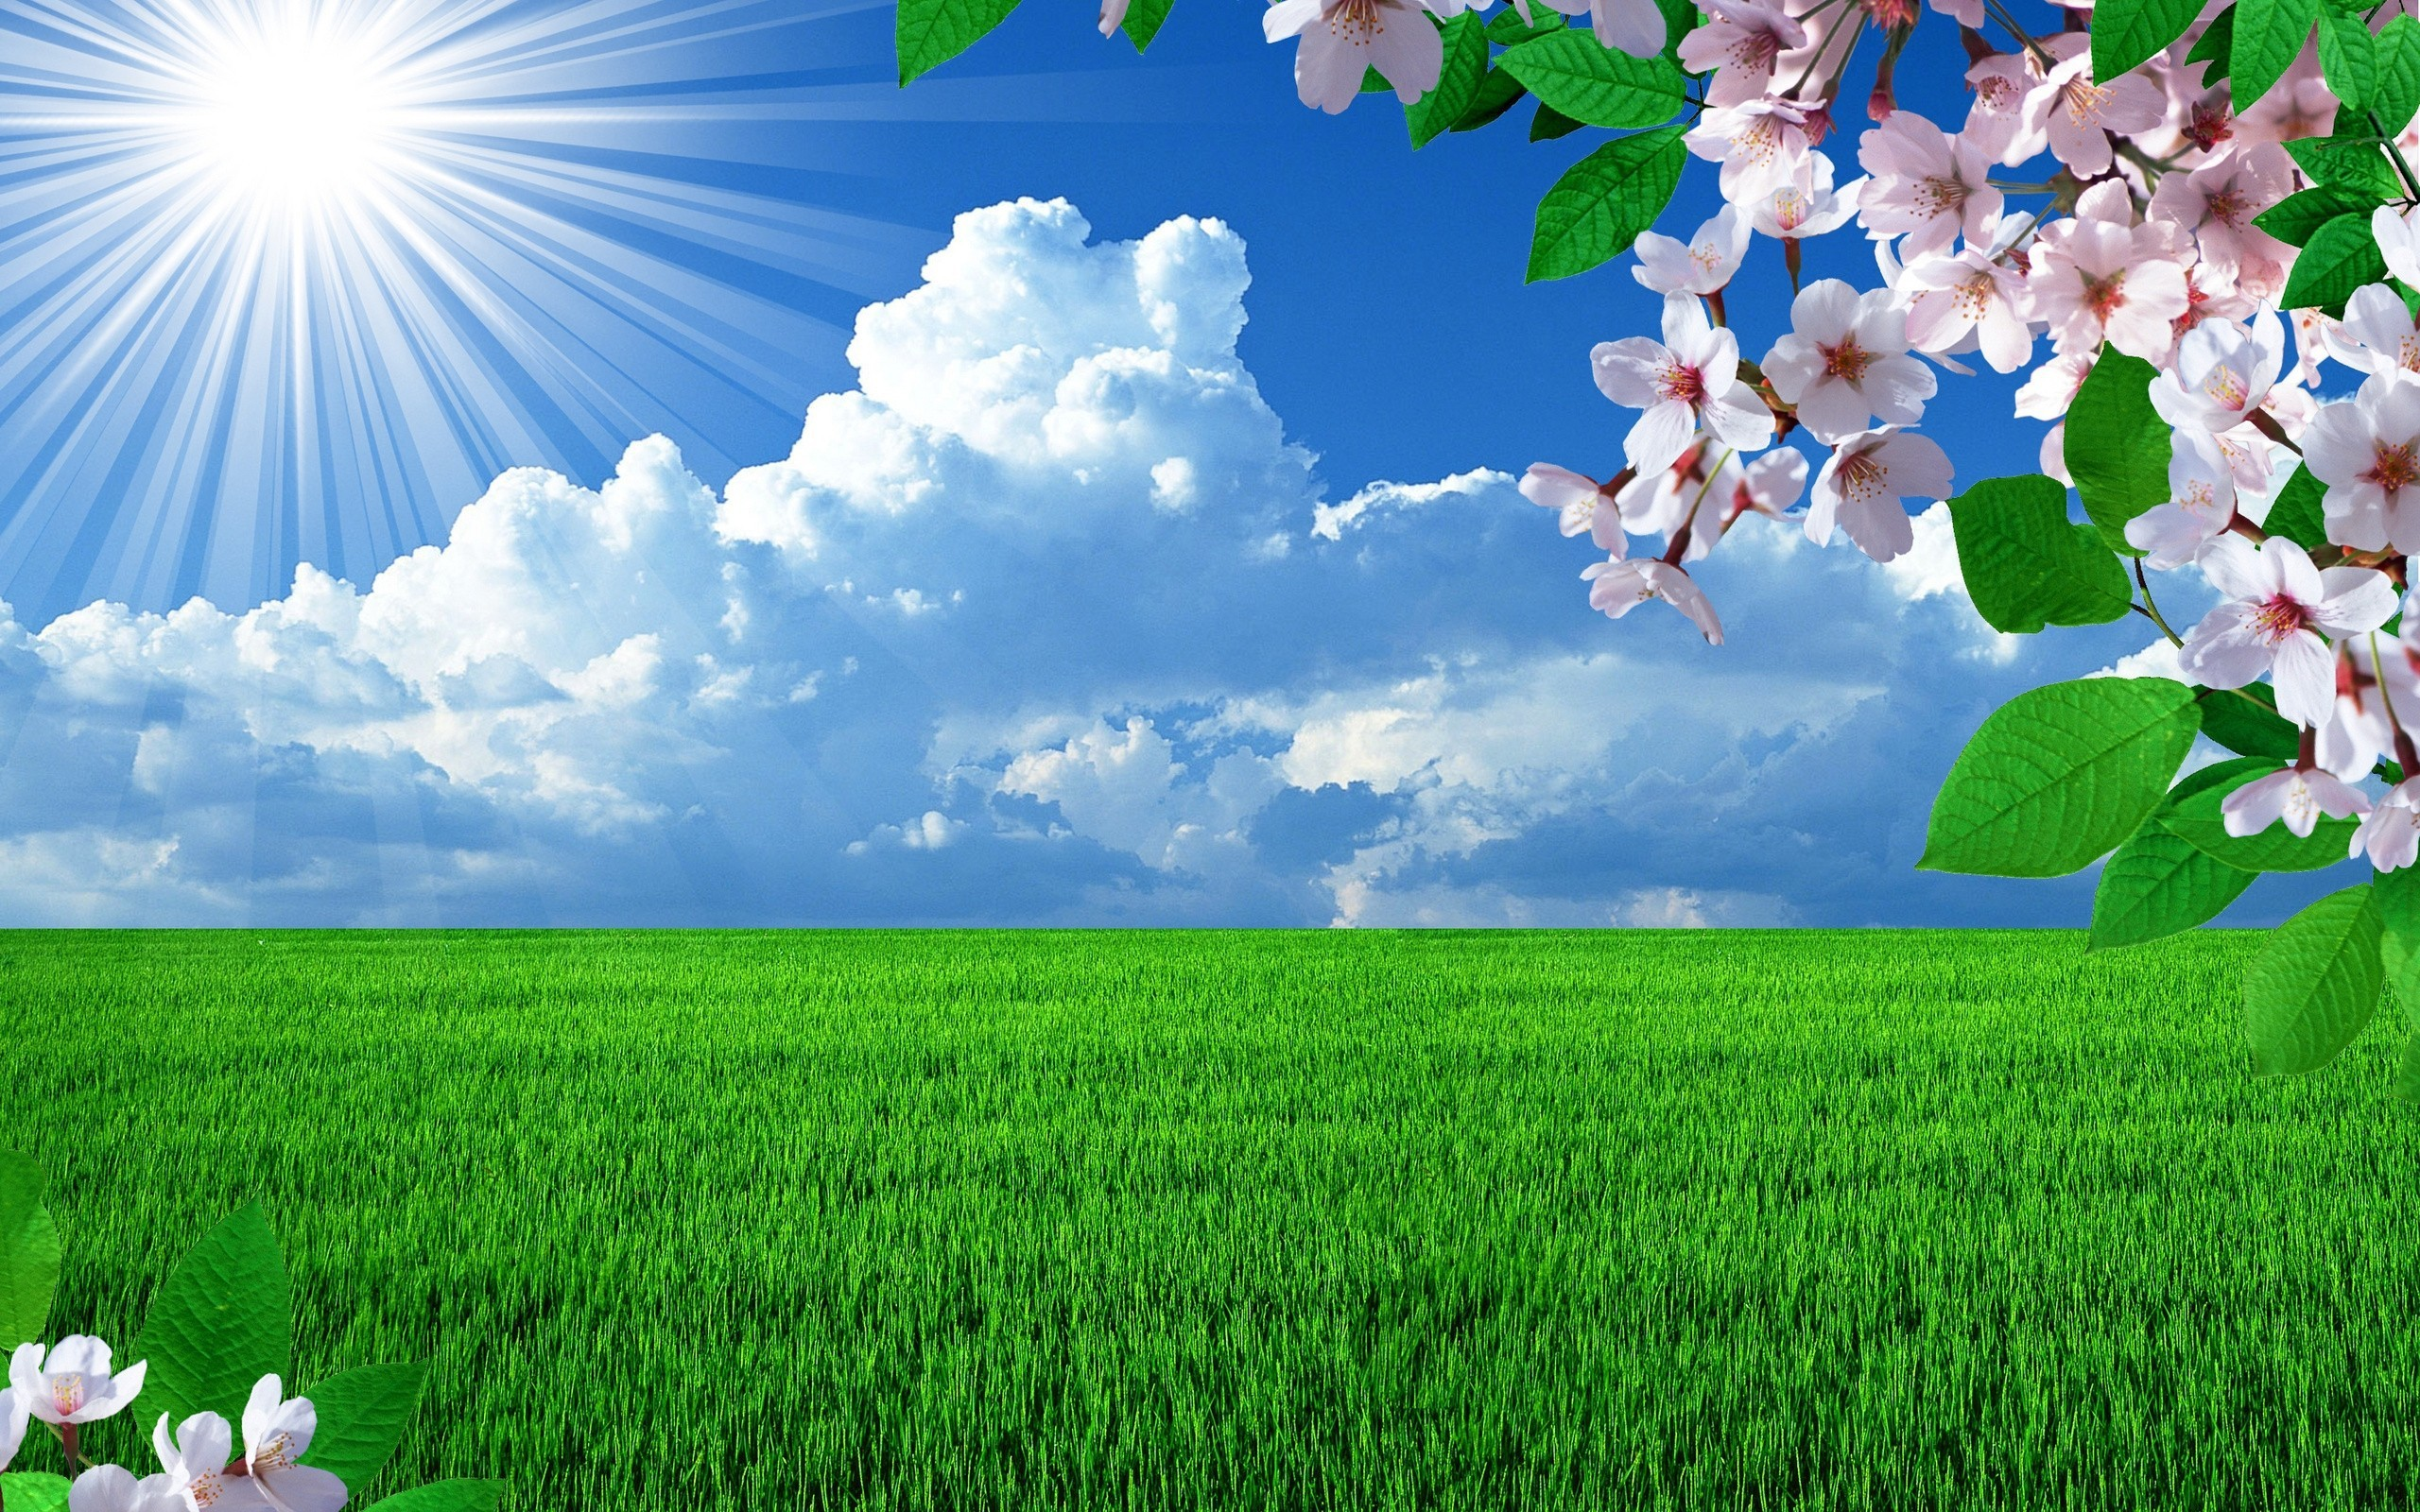 Beautiful Nature Wallpapers for your desktop